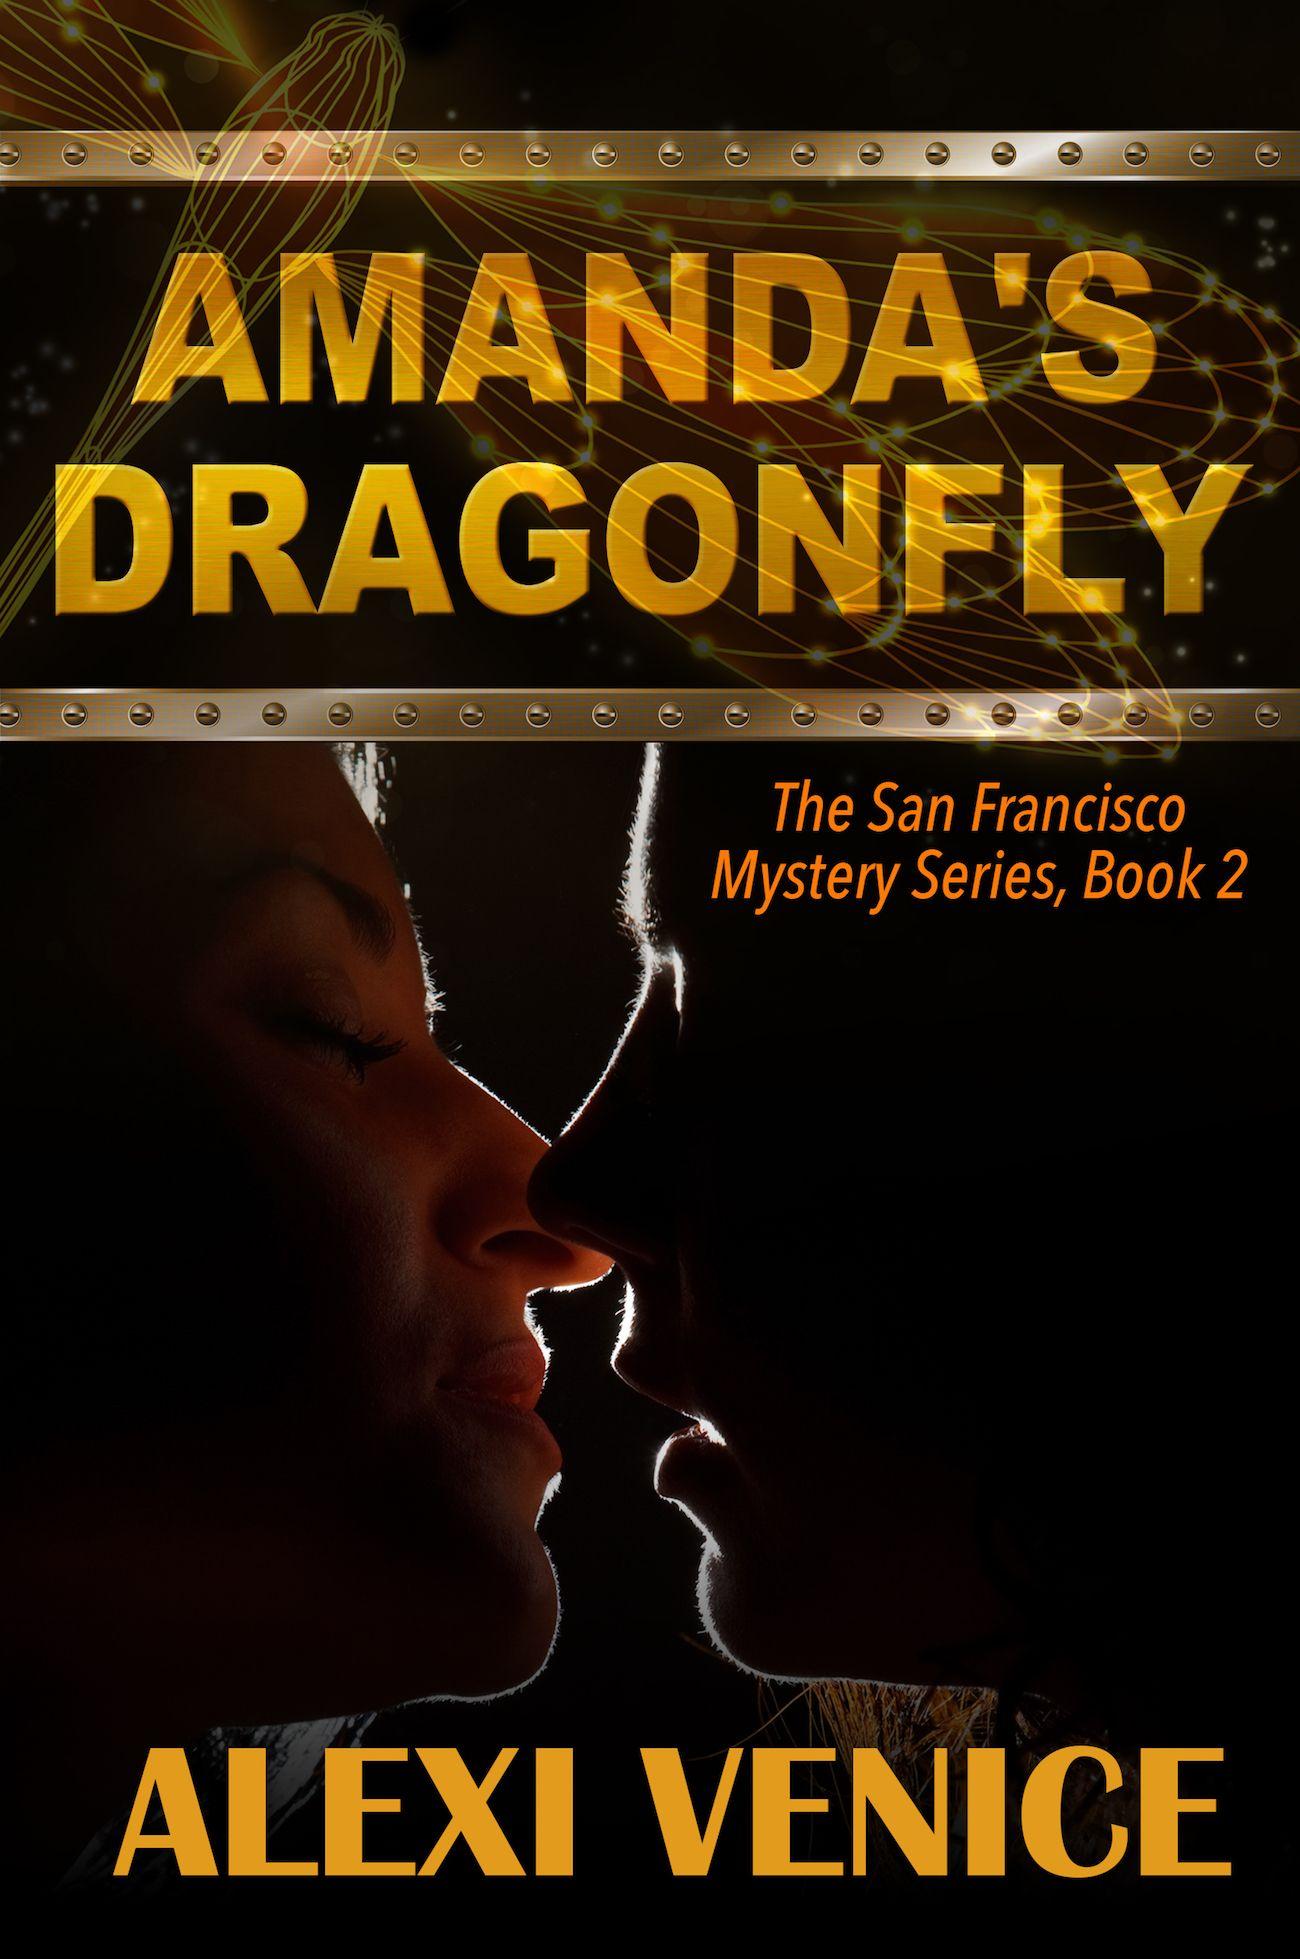 Amanda's Dragonfly, The San Francisco Mystery Series, Book 2